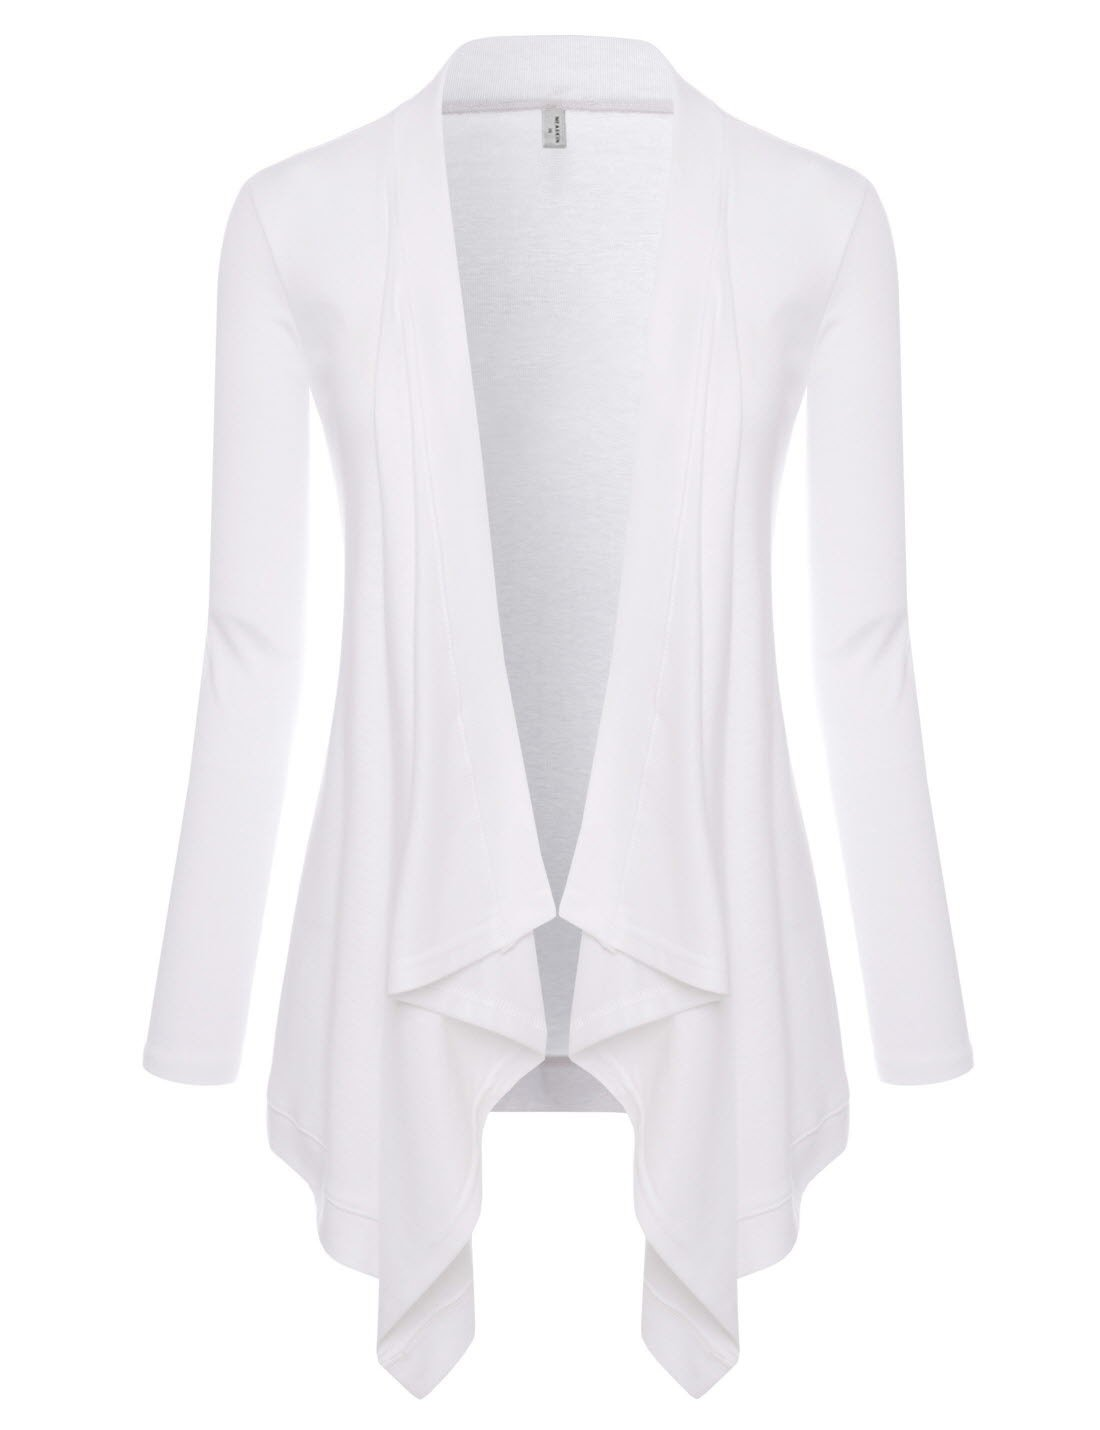 NEARKIN (NKNKWCD692) Womens Lightweight Long Sleeve Open Front Drape Tunic Cardigans WHITE US S(Tag size M)